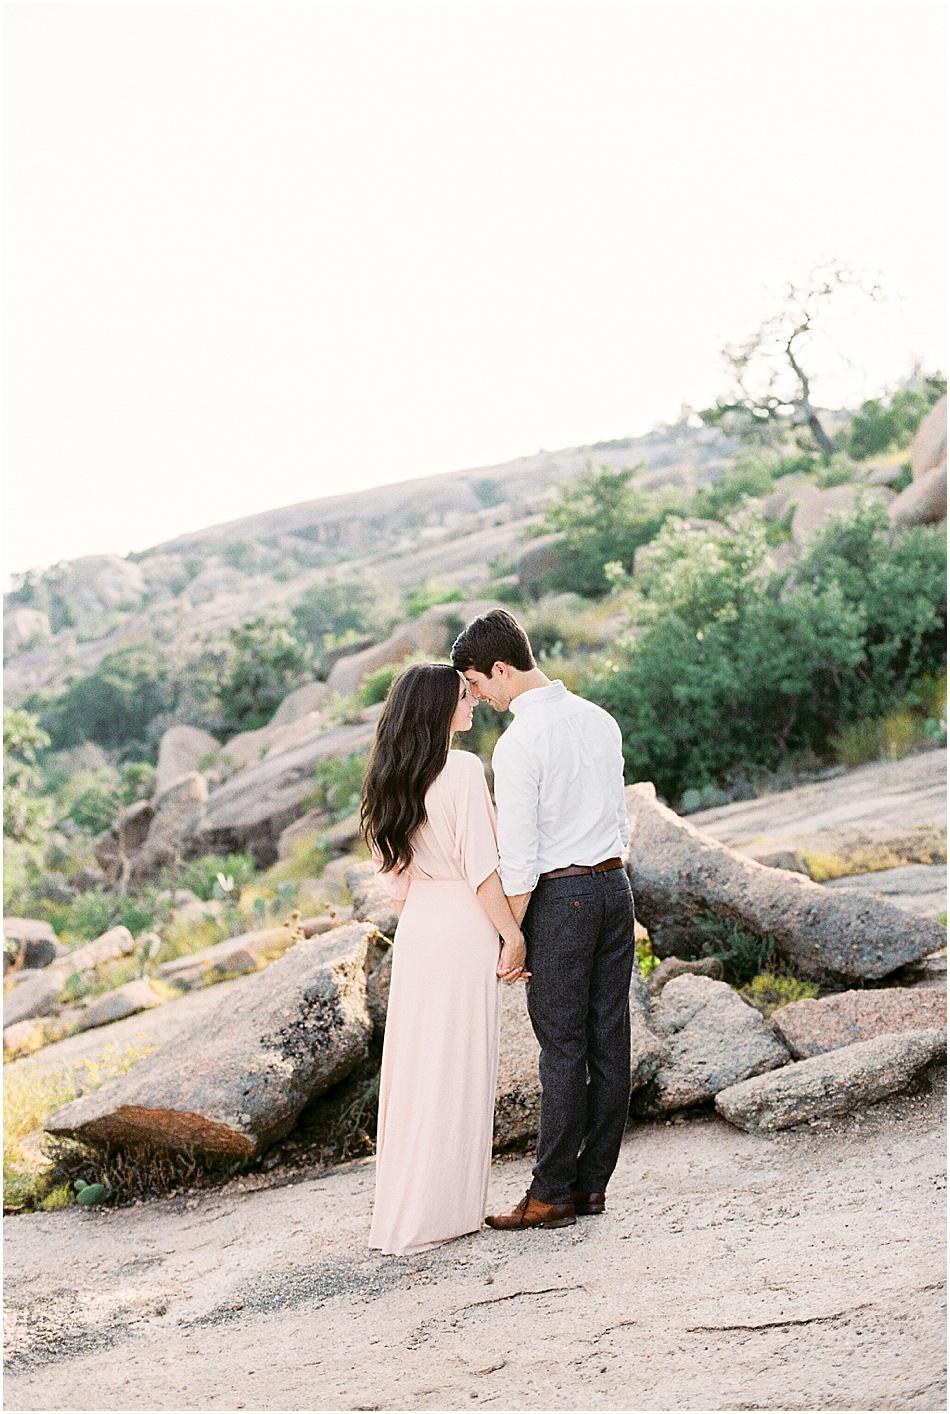 Emilie Anne Photography | Fine Art Film | Featured | Magnolia Rouge | Central Texas-4.jpg